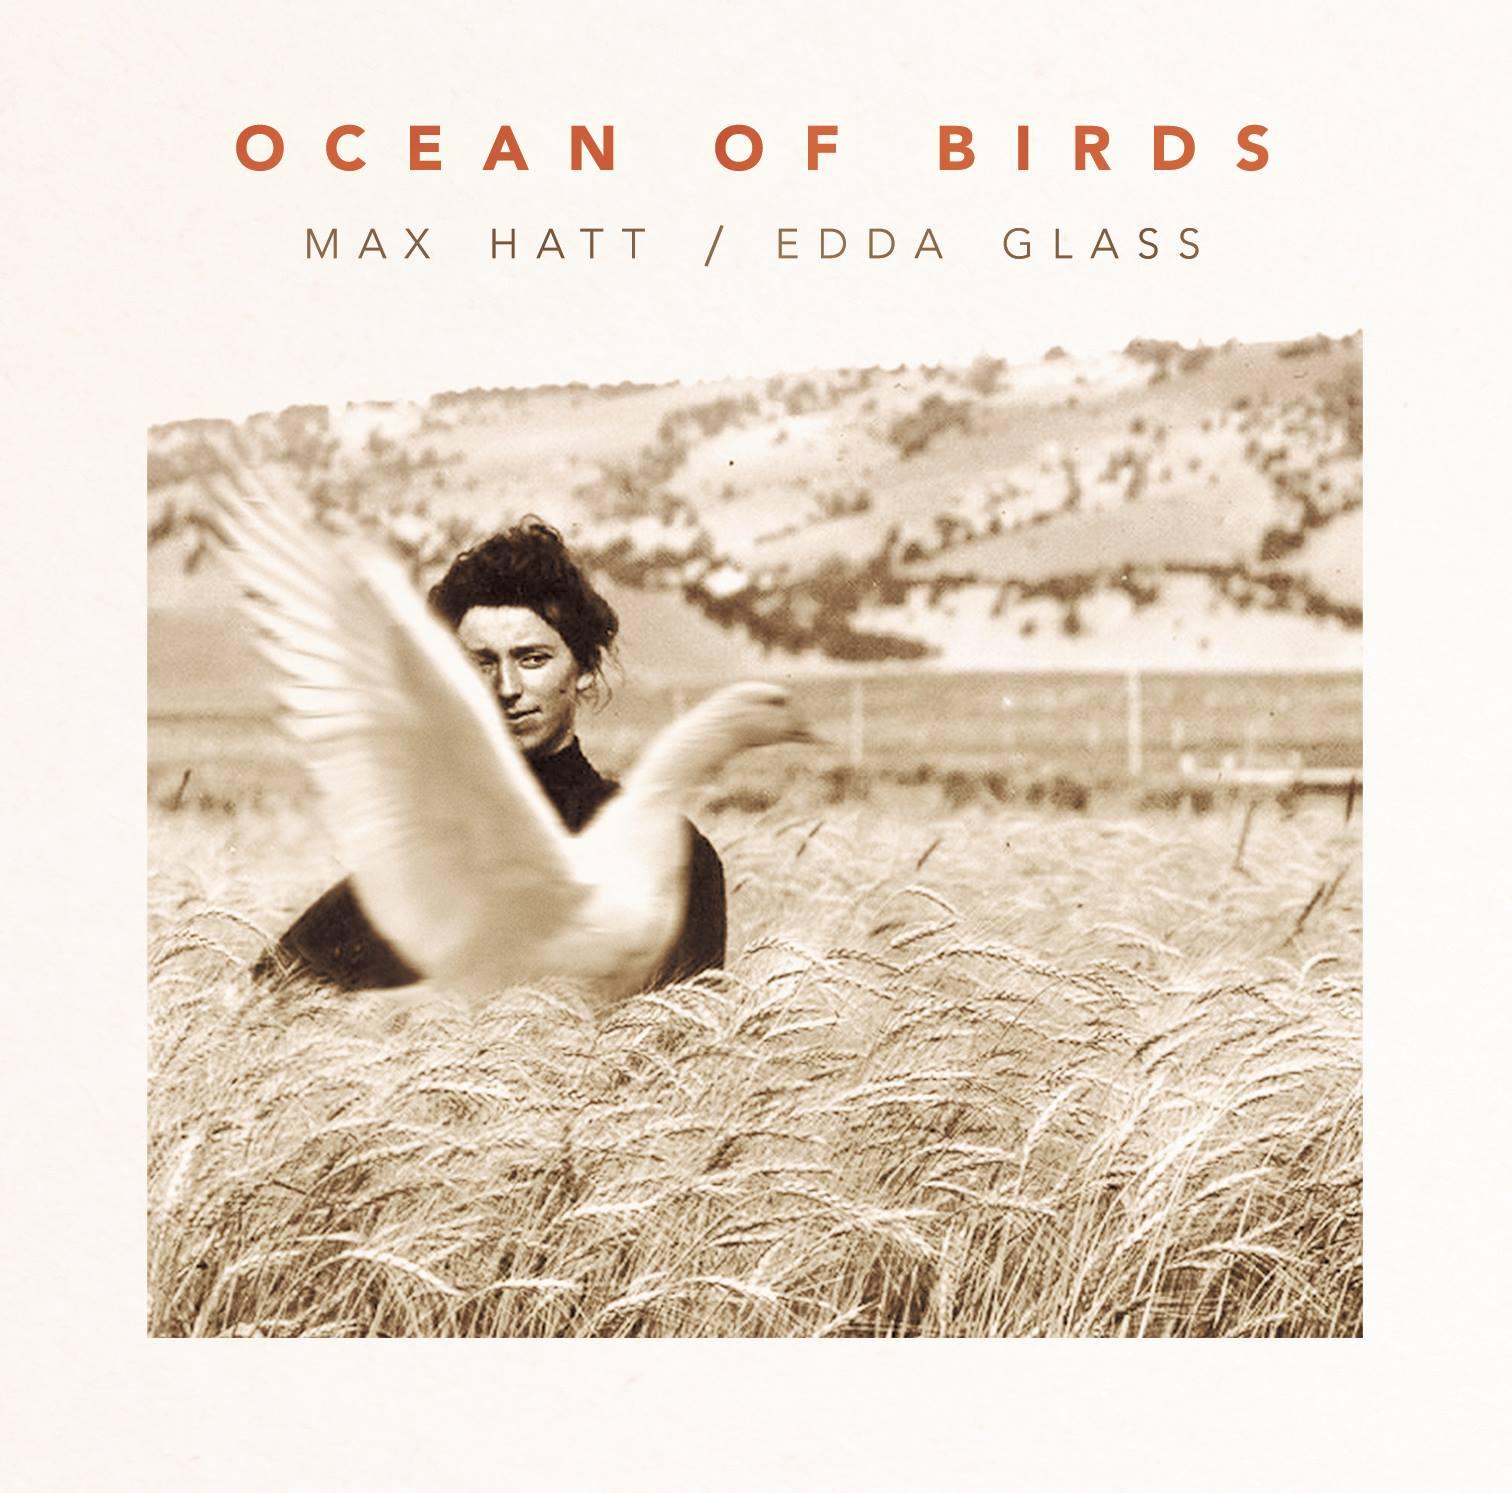 Max Hatt / Edda Glass